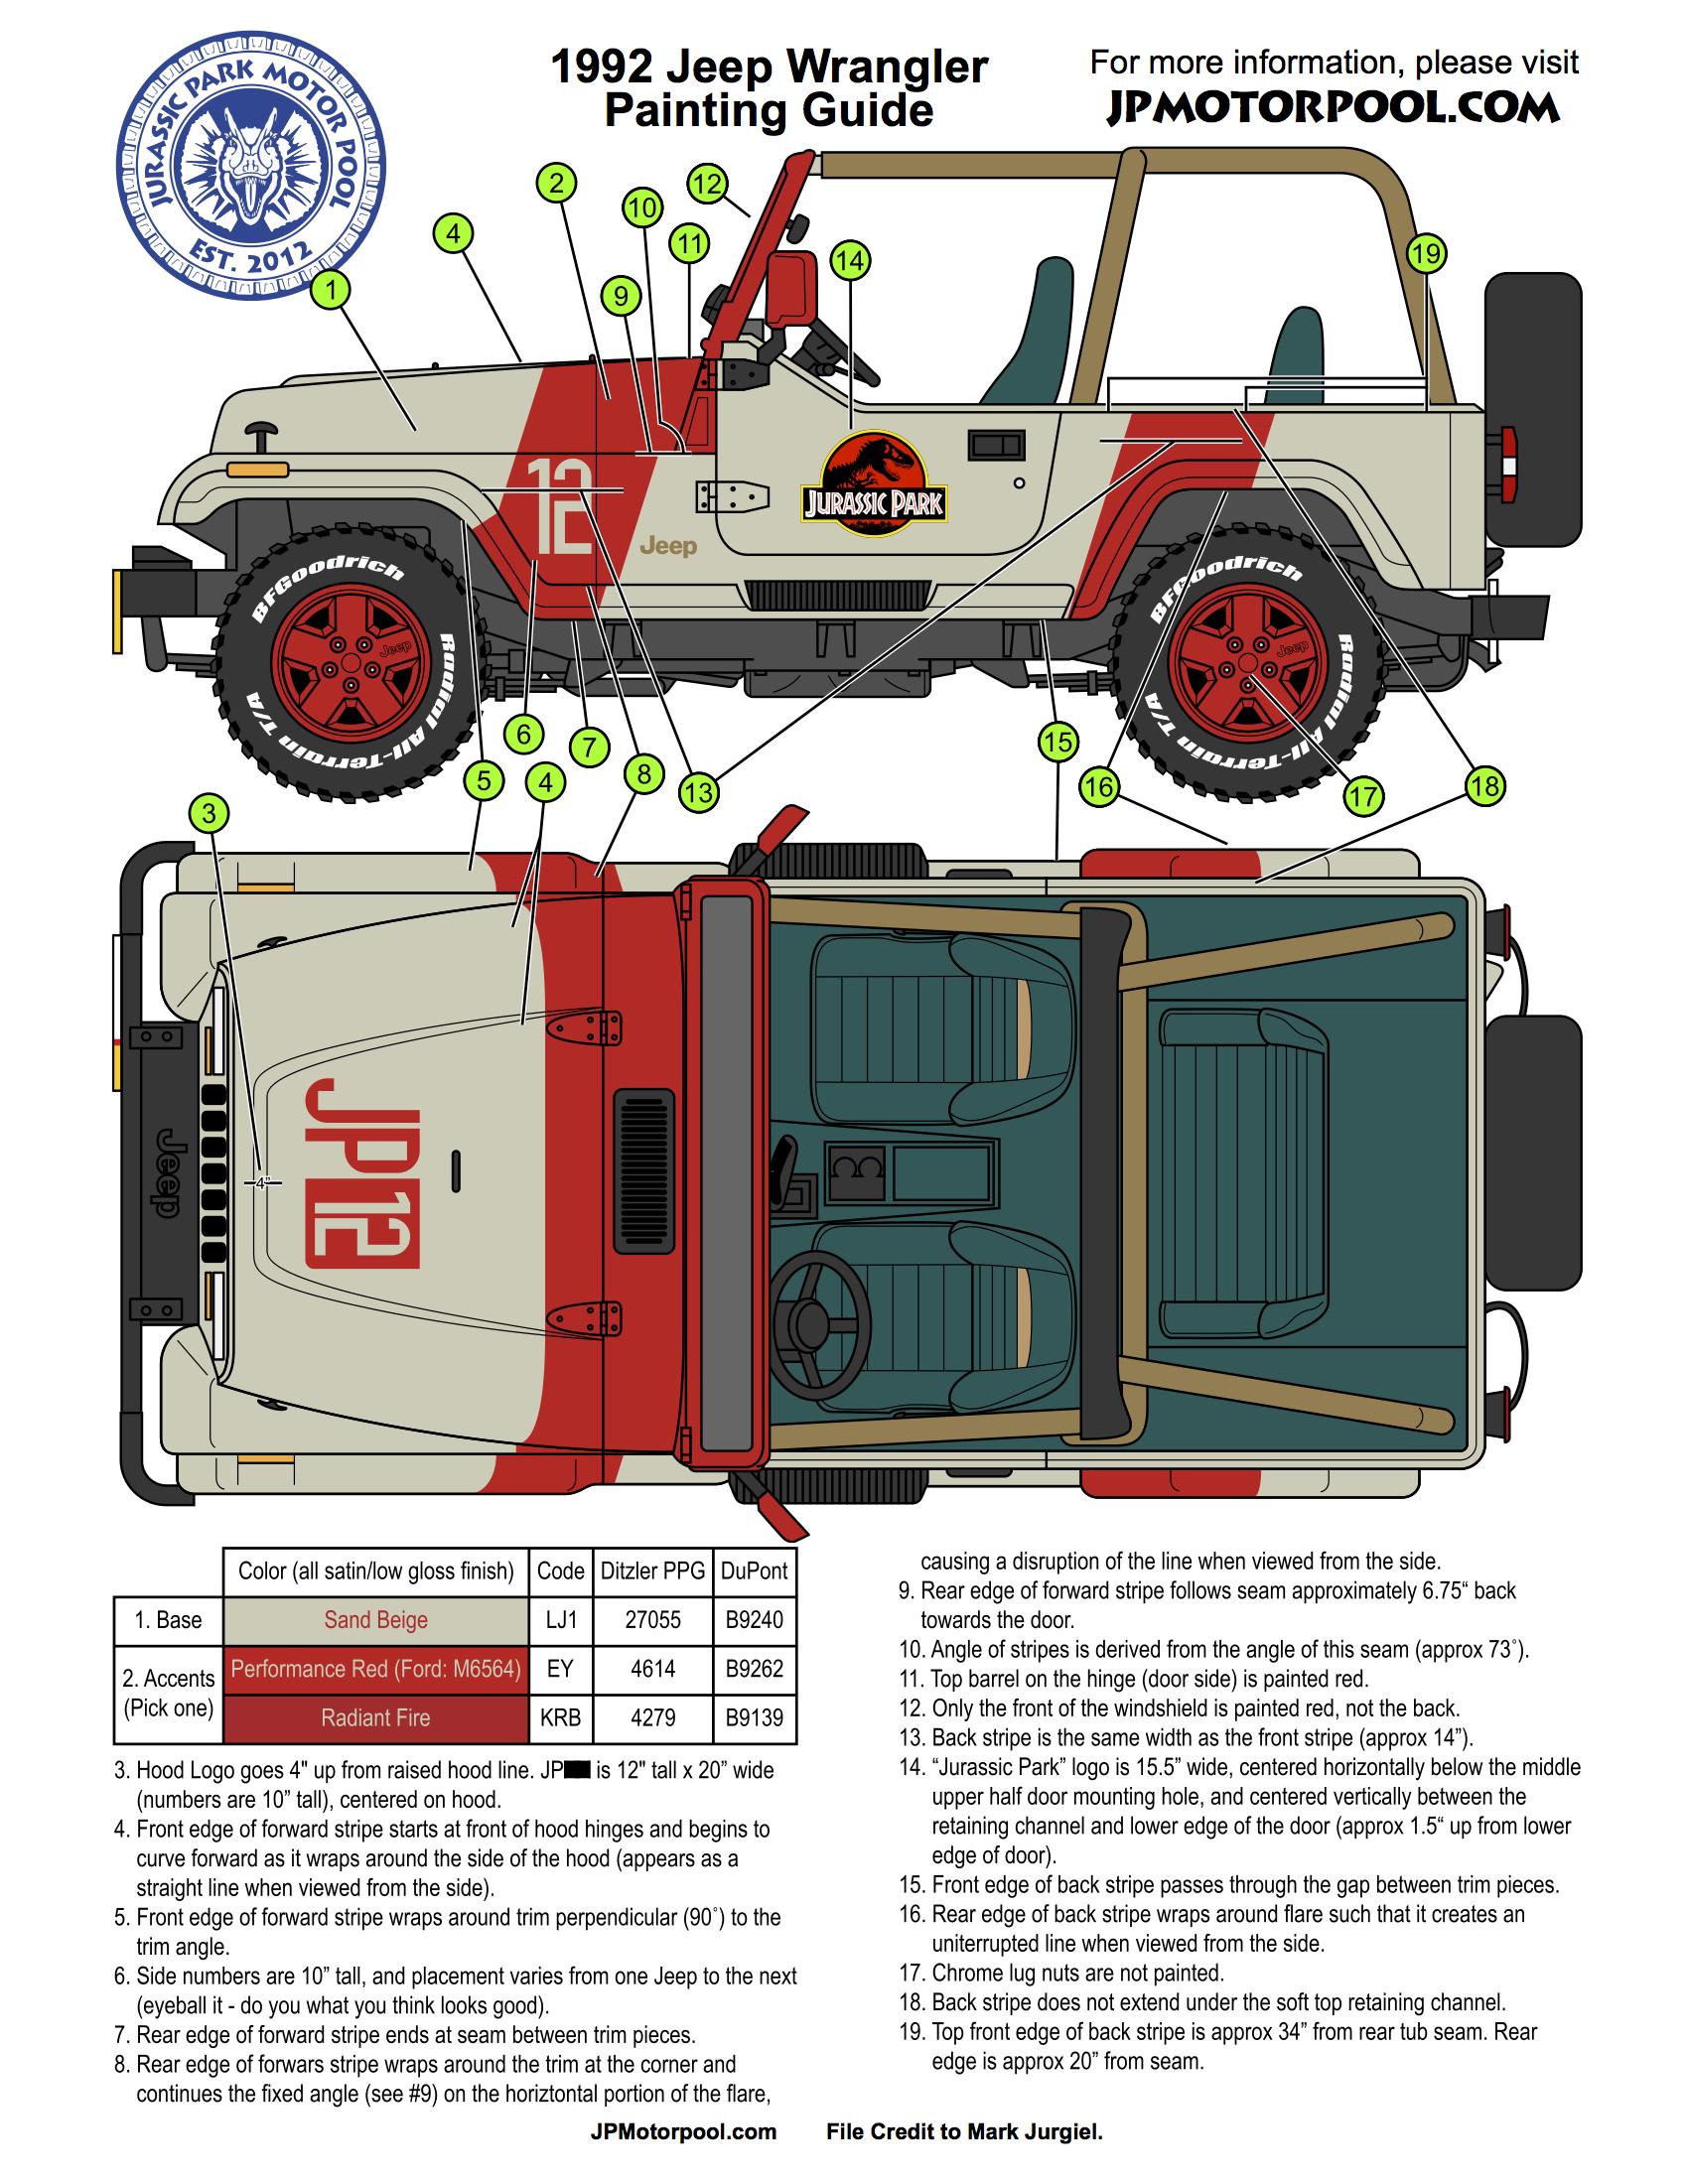 Image Result For 1992 Jeep Wrangler Yj Sahara Jurassic Park Jurassic Park Car Jurassic Park Jeep Jurassic Park